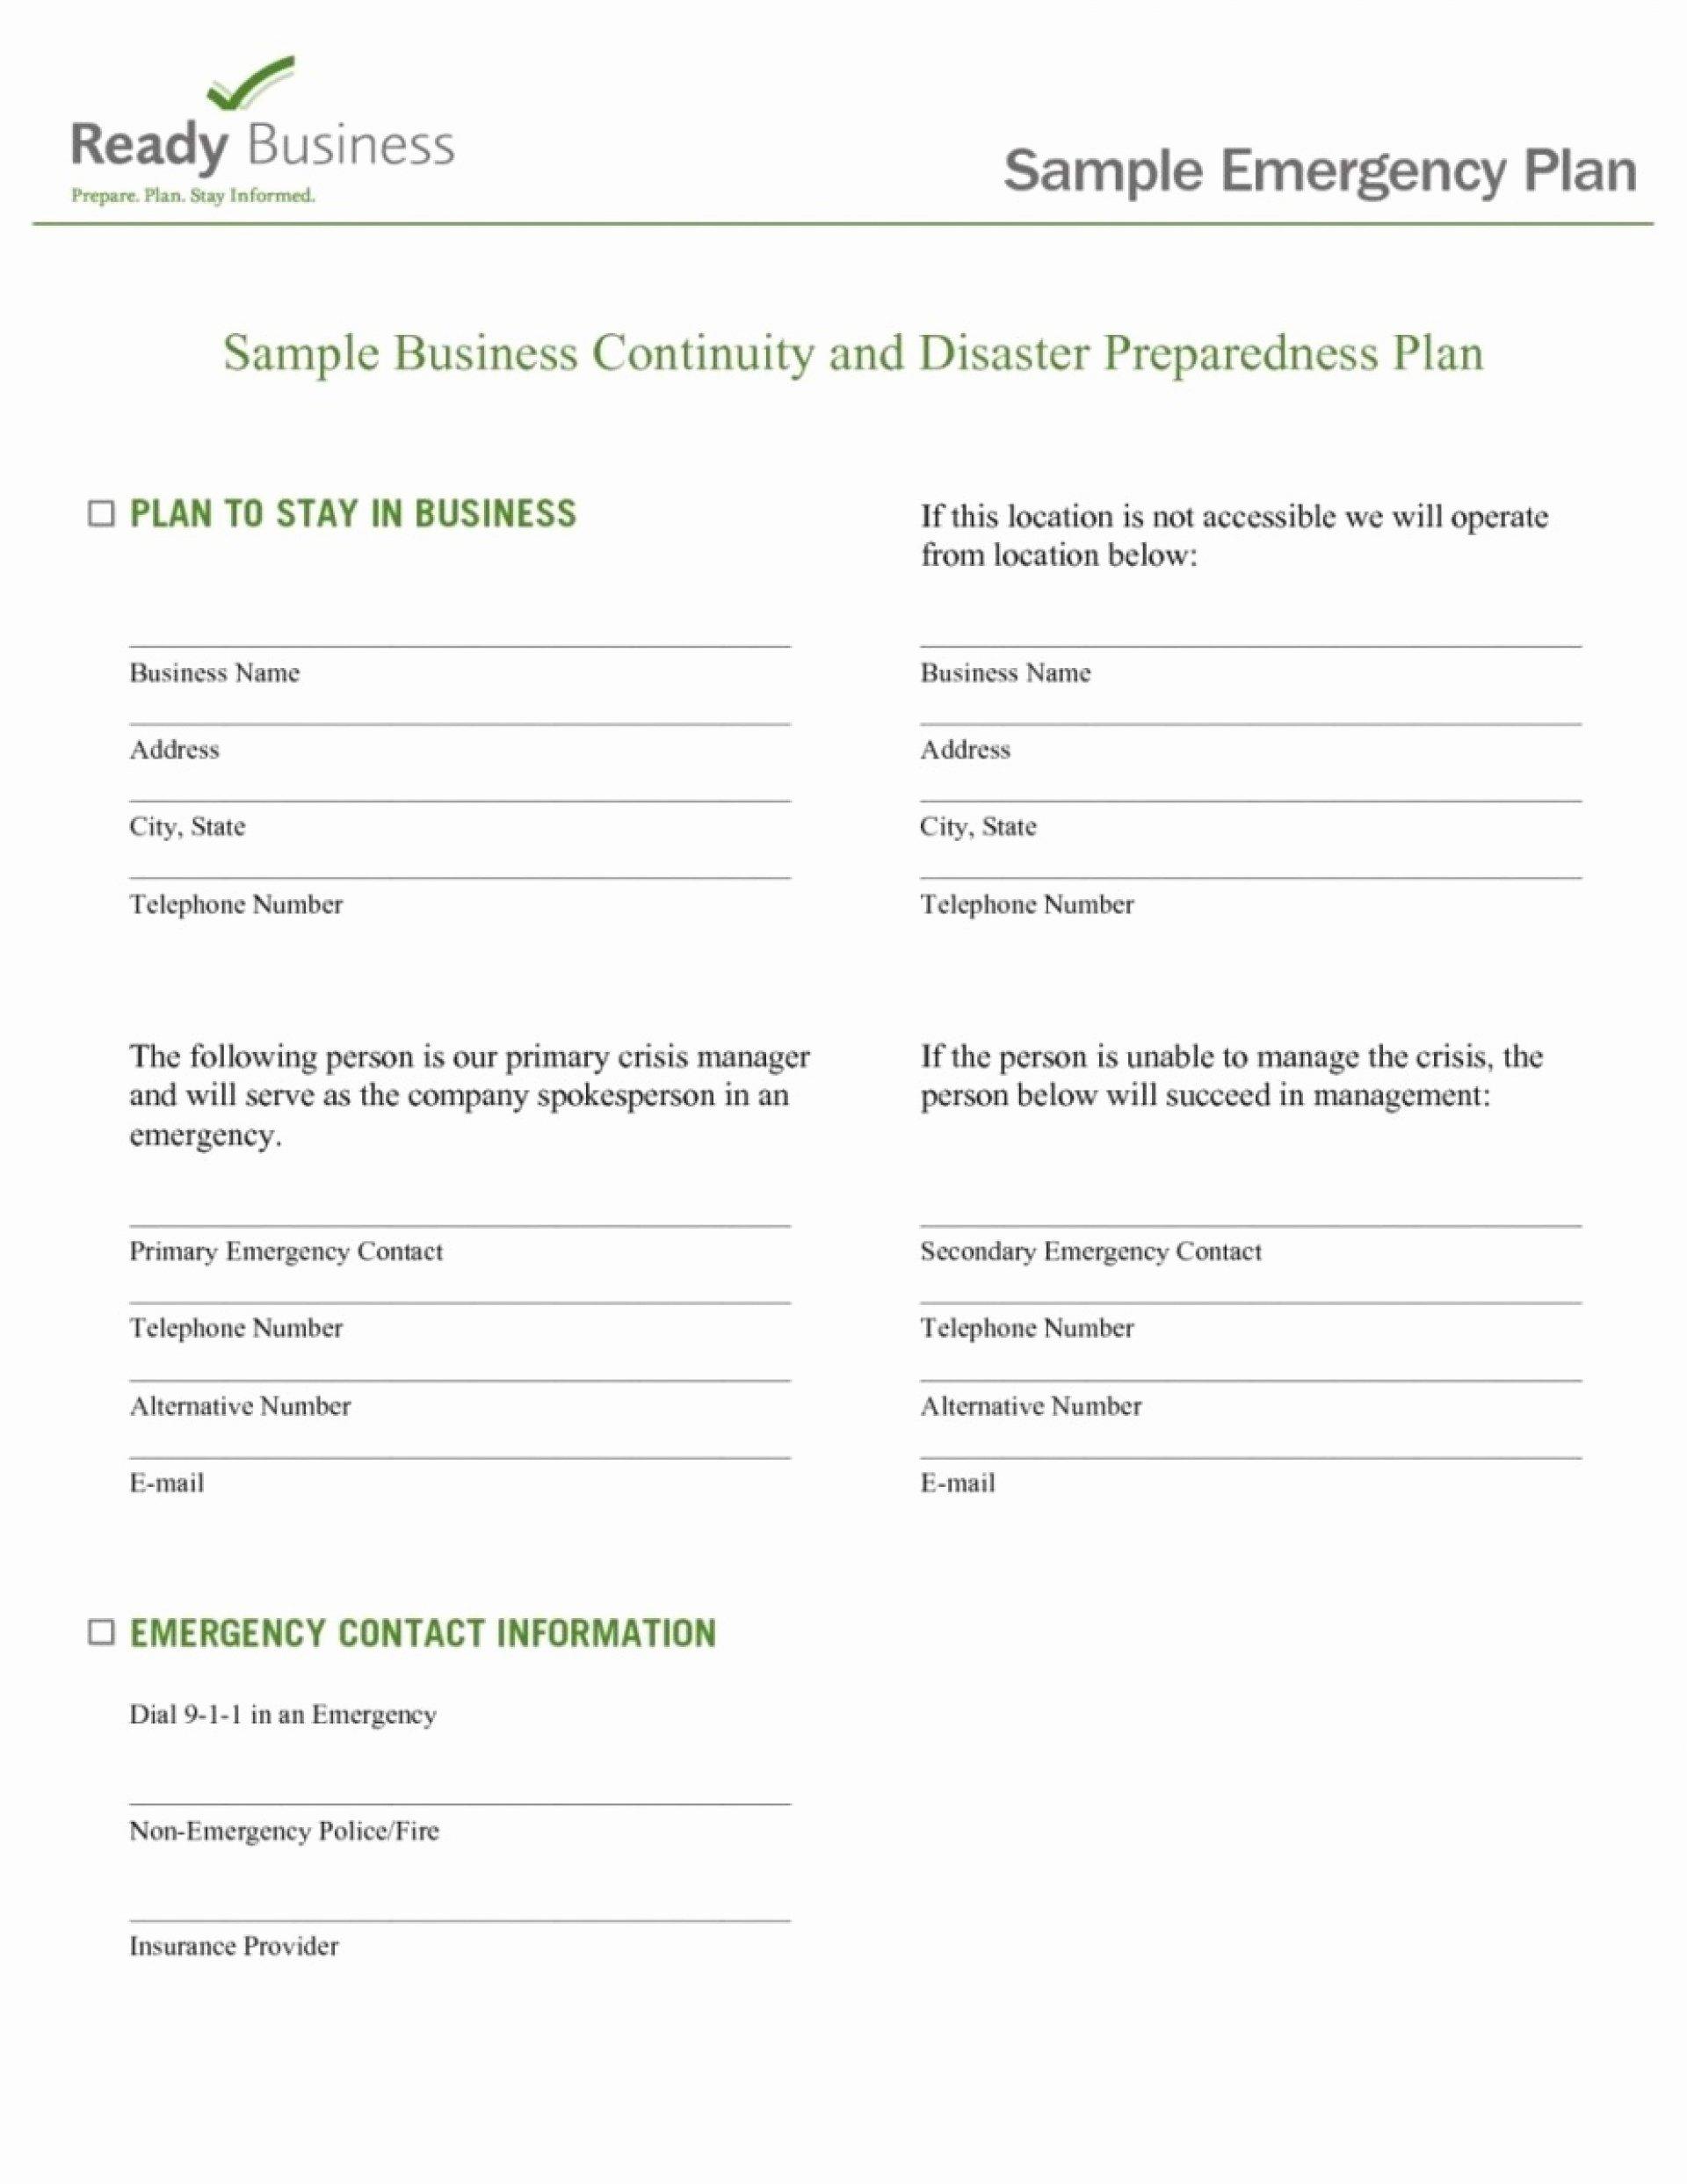 Hospital Emergency Preparedness Plan Template New Impressive Hospital Emergency Preparedness Plan Template